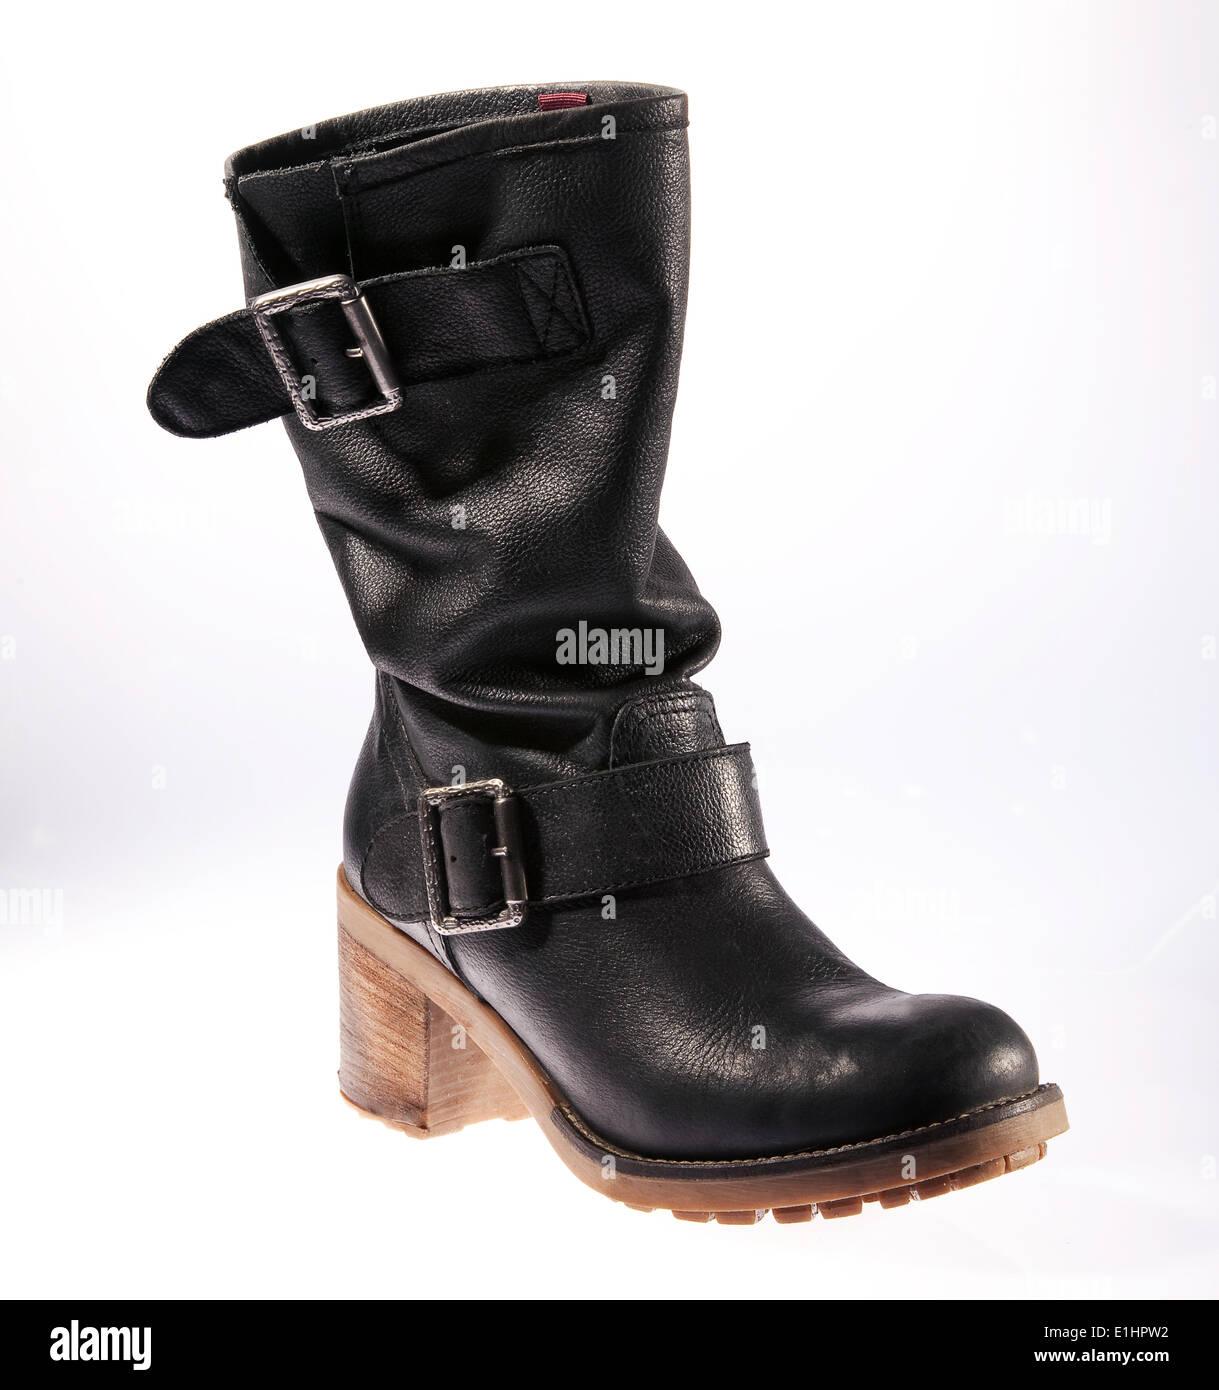 One black leather female boot isolated on white background - Stock Image